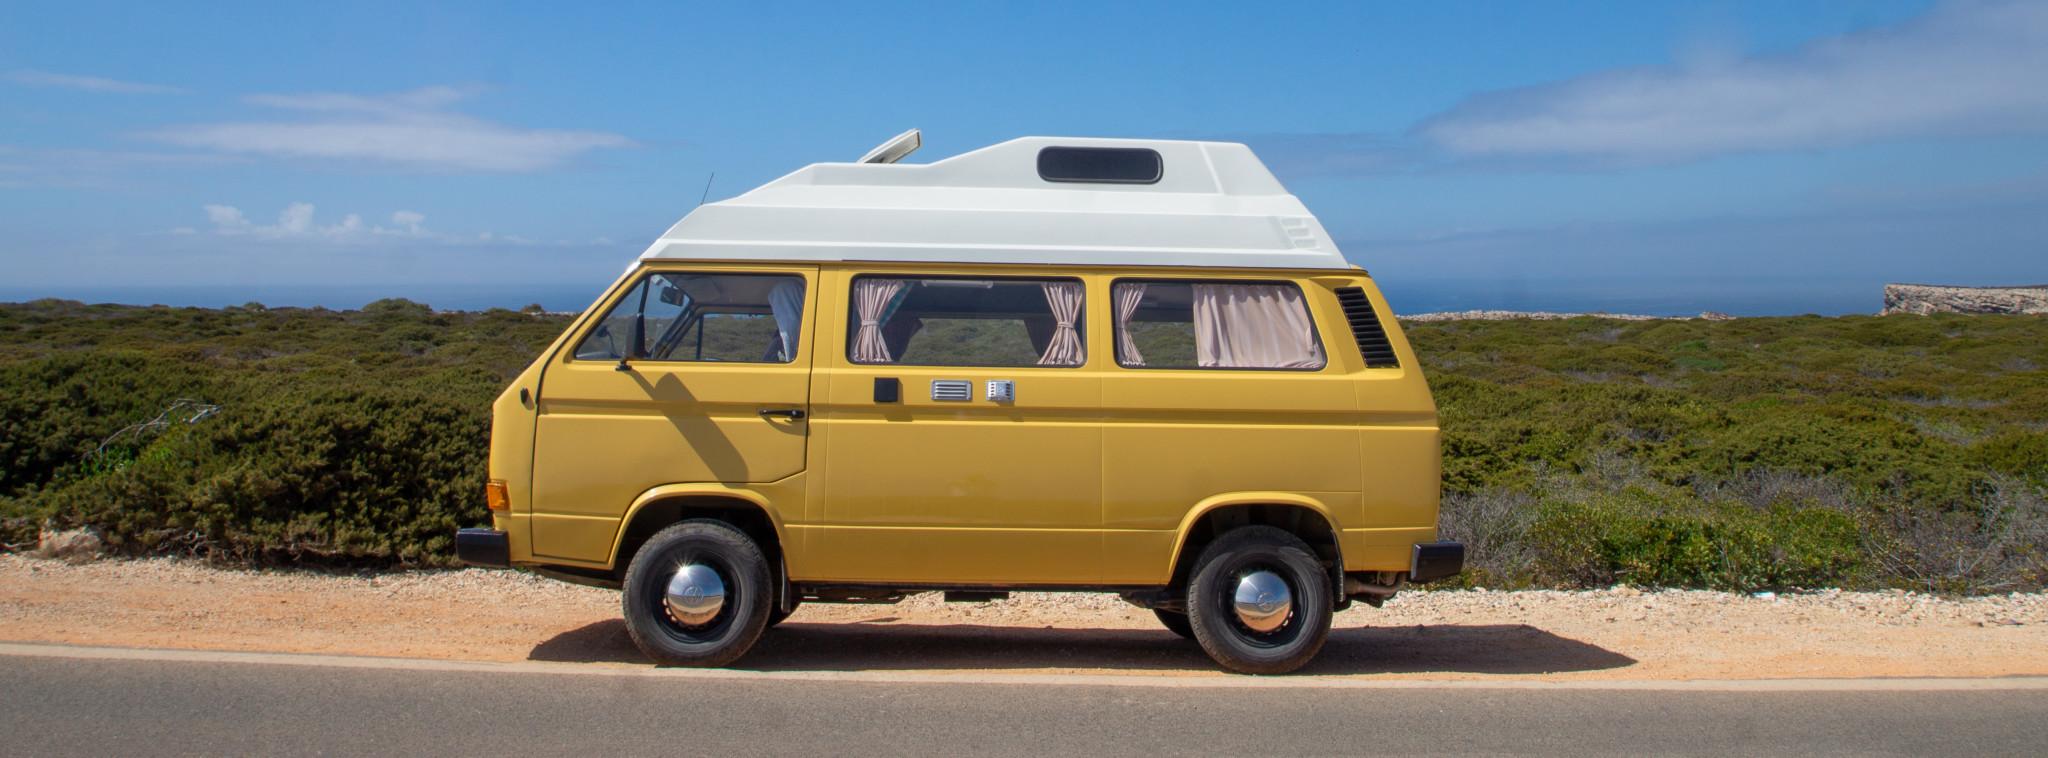 Roadtrip in Portugal mit dem Campervan